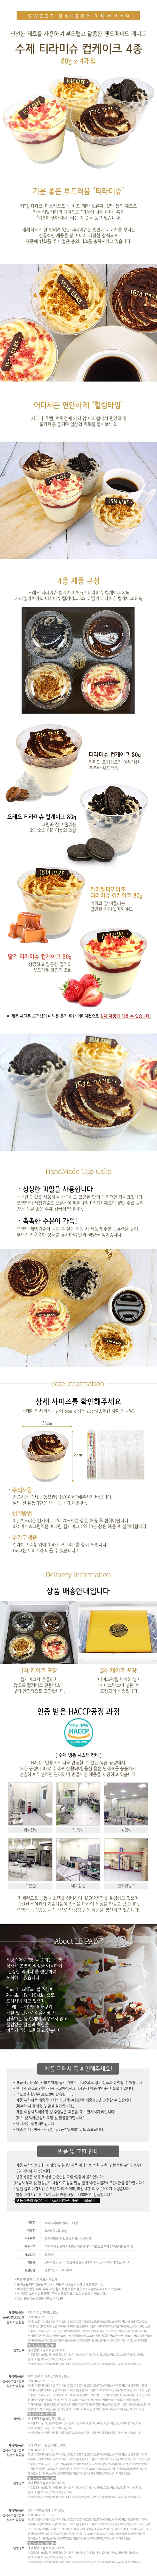 LP_T_cupcake4.jpg